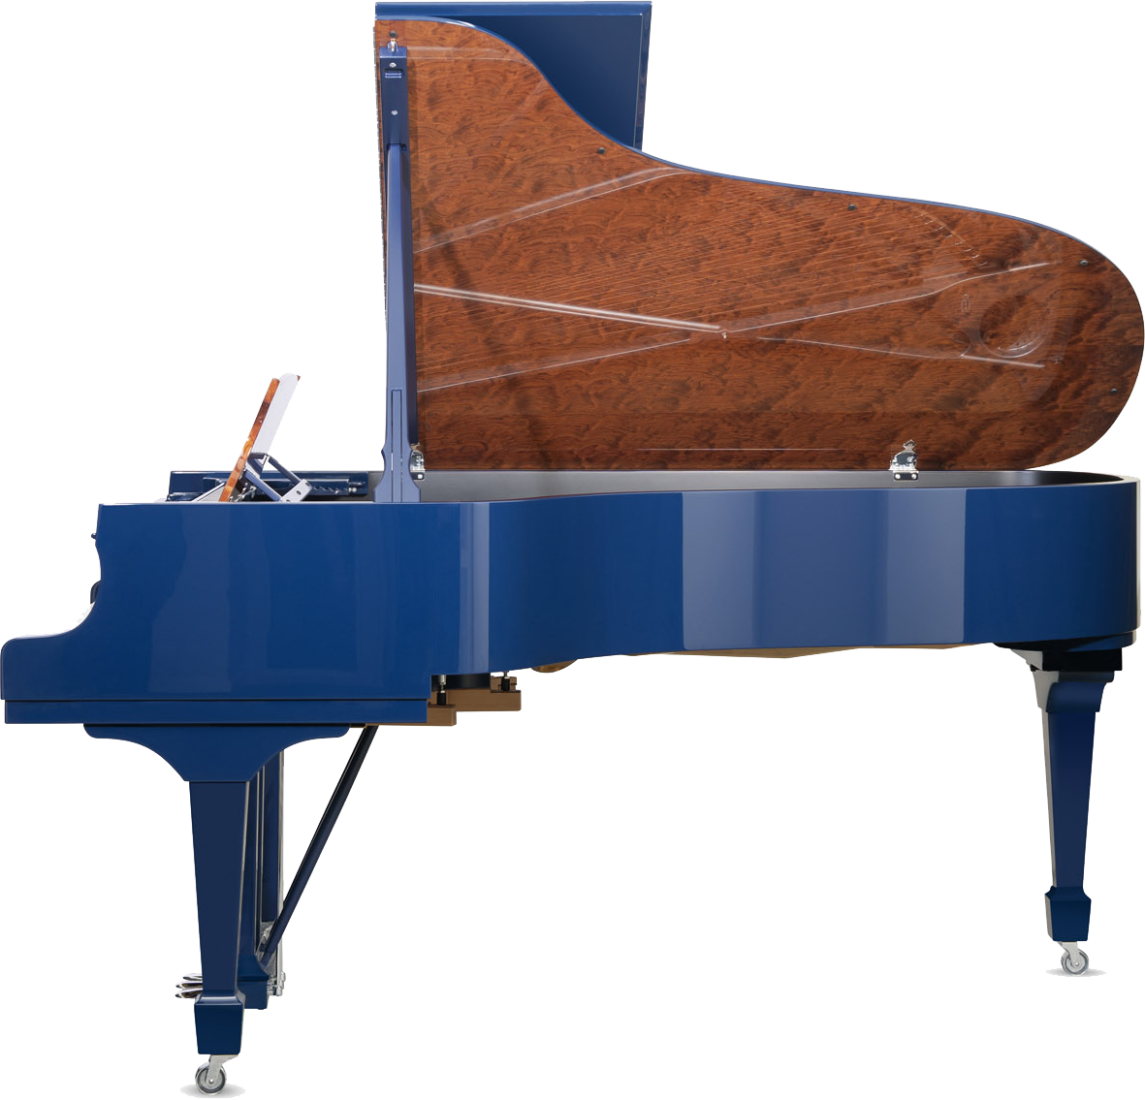 piano-cola-steinway-sons-b211-spirio-artesanal-blue-nuevo-azul-unico-edicion-limitada-lateral